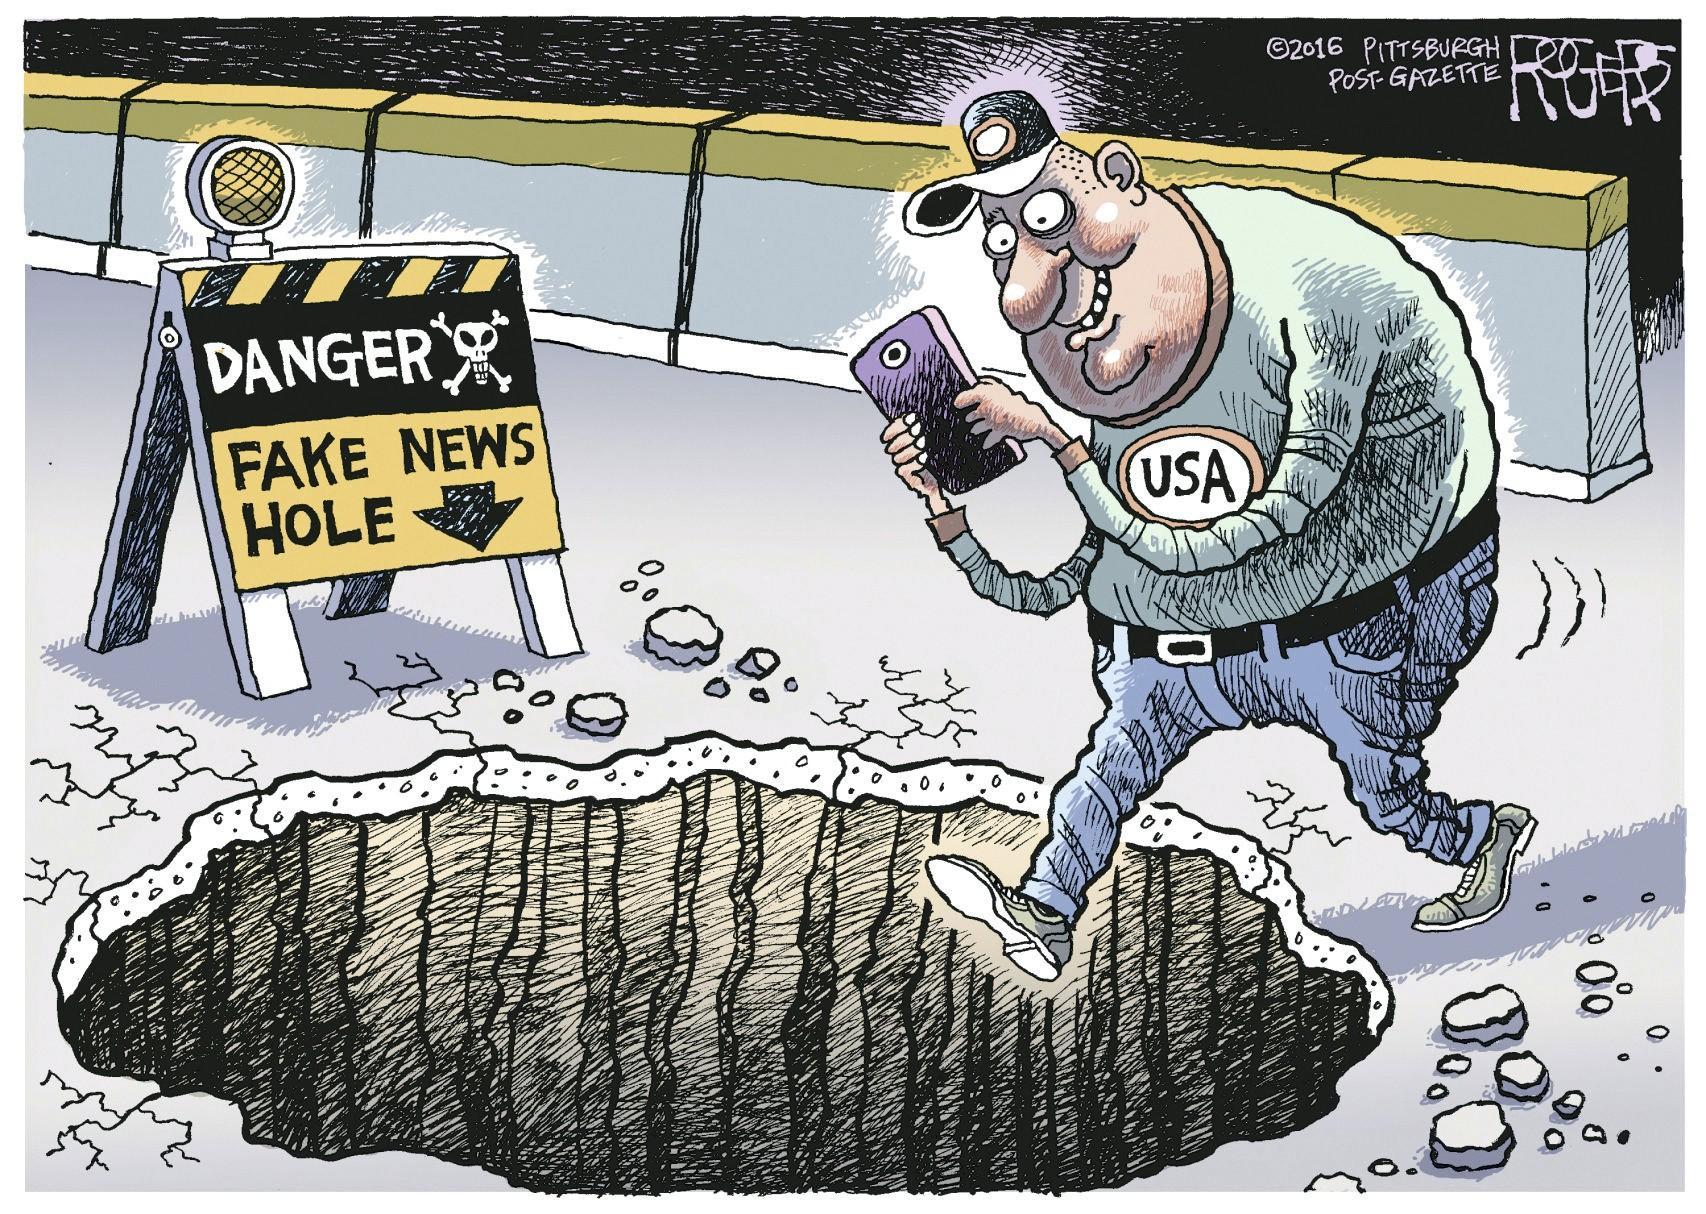 News Hole, Rob Rogers, Pittsburgh Post Gazette, 2016.